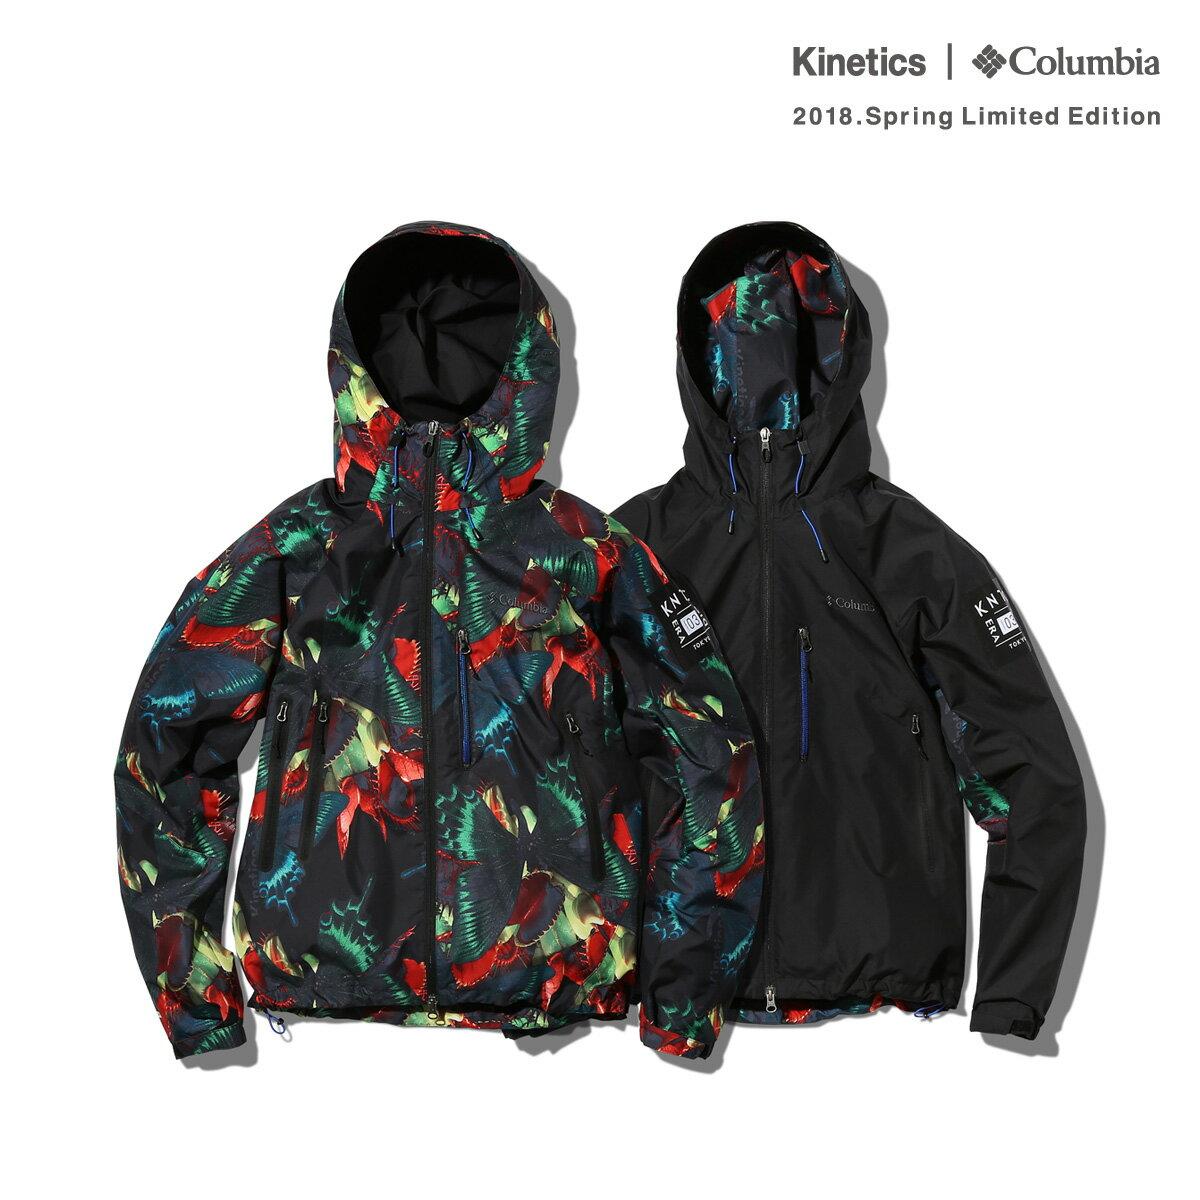 Kinetics × Columbia Pliny Peak Jacket (2色展開) 【OMNI-SHIELD】【撥水】【防汚】【18SP-S】